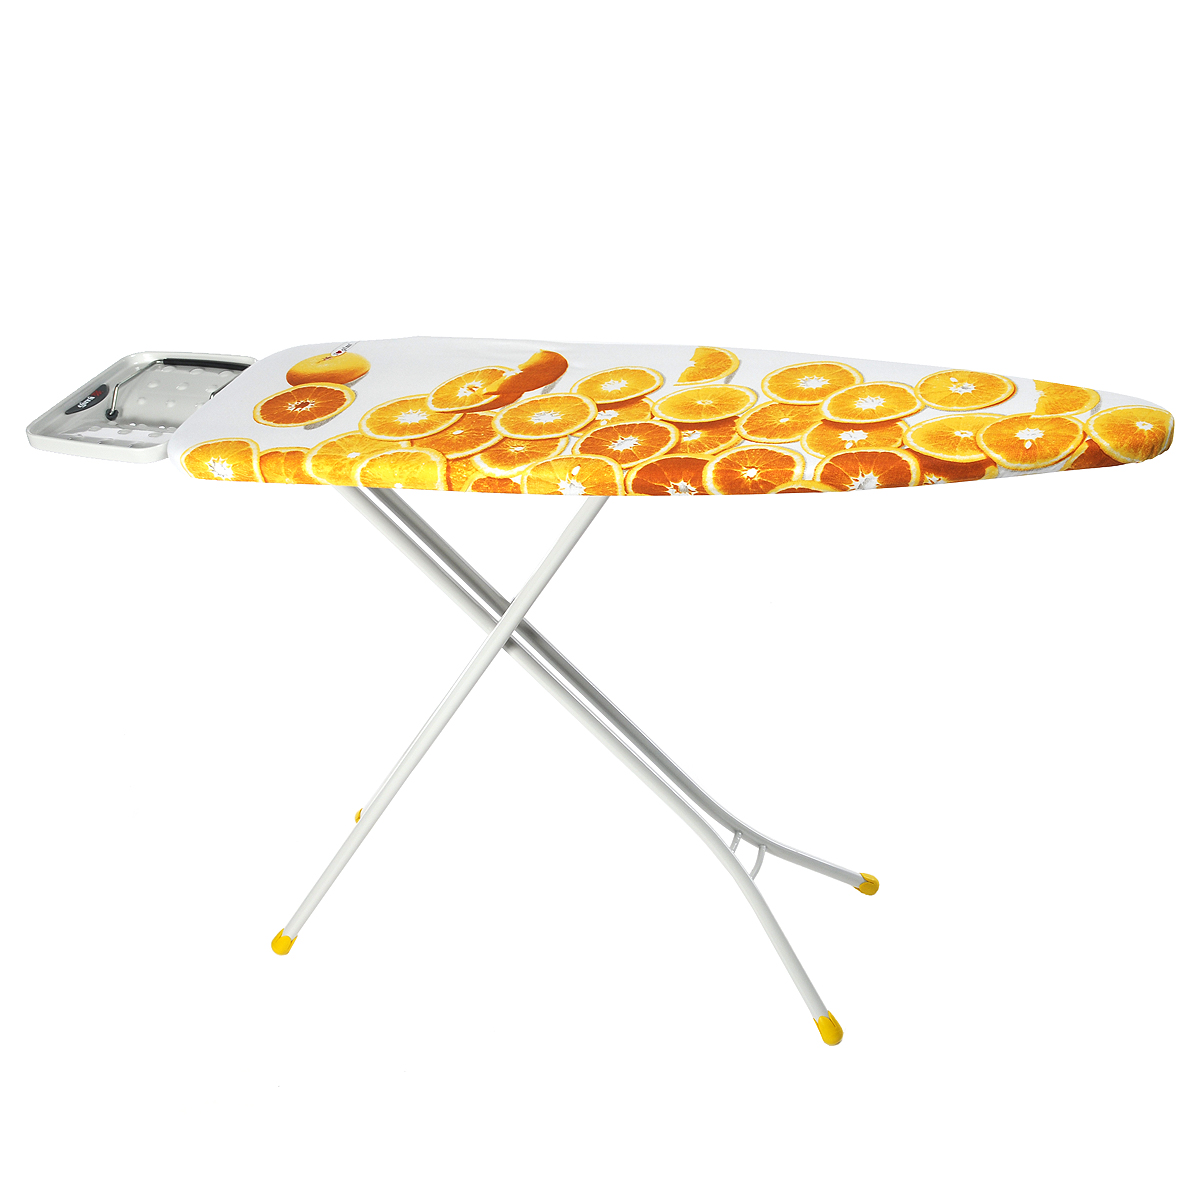 "Доска гладильная Gimi ""Classic. Апельсин"", 110 см х 33 см"